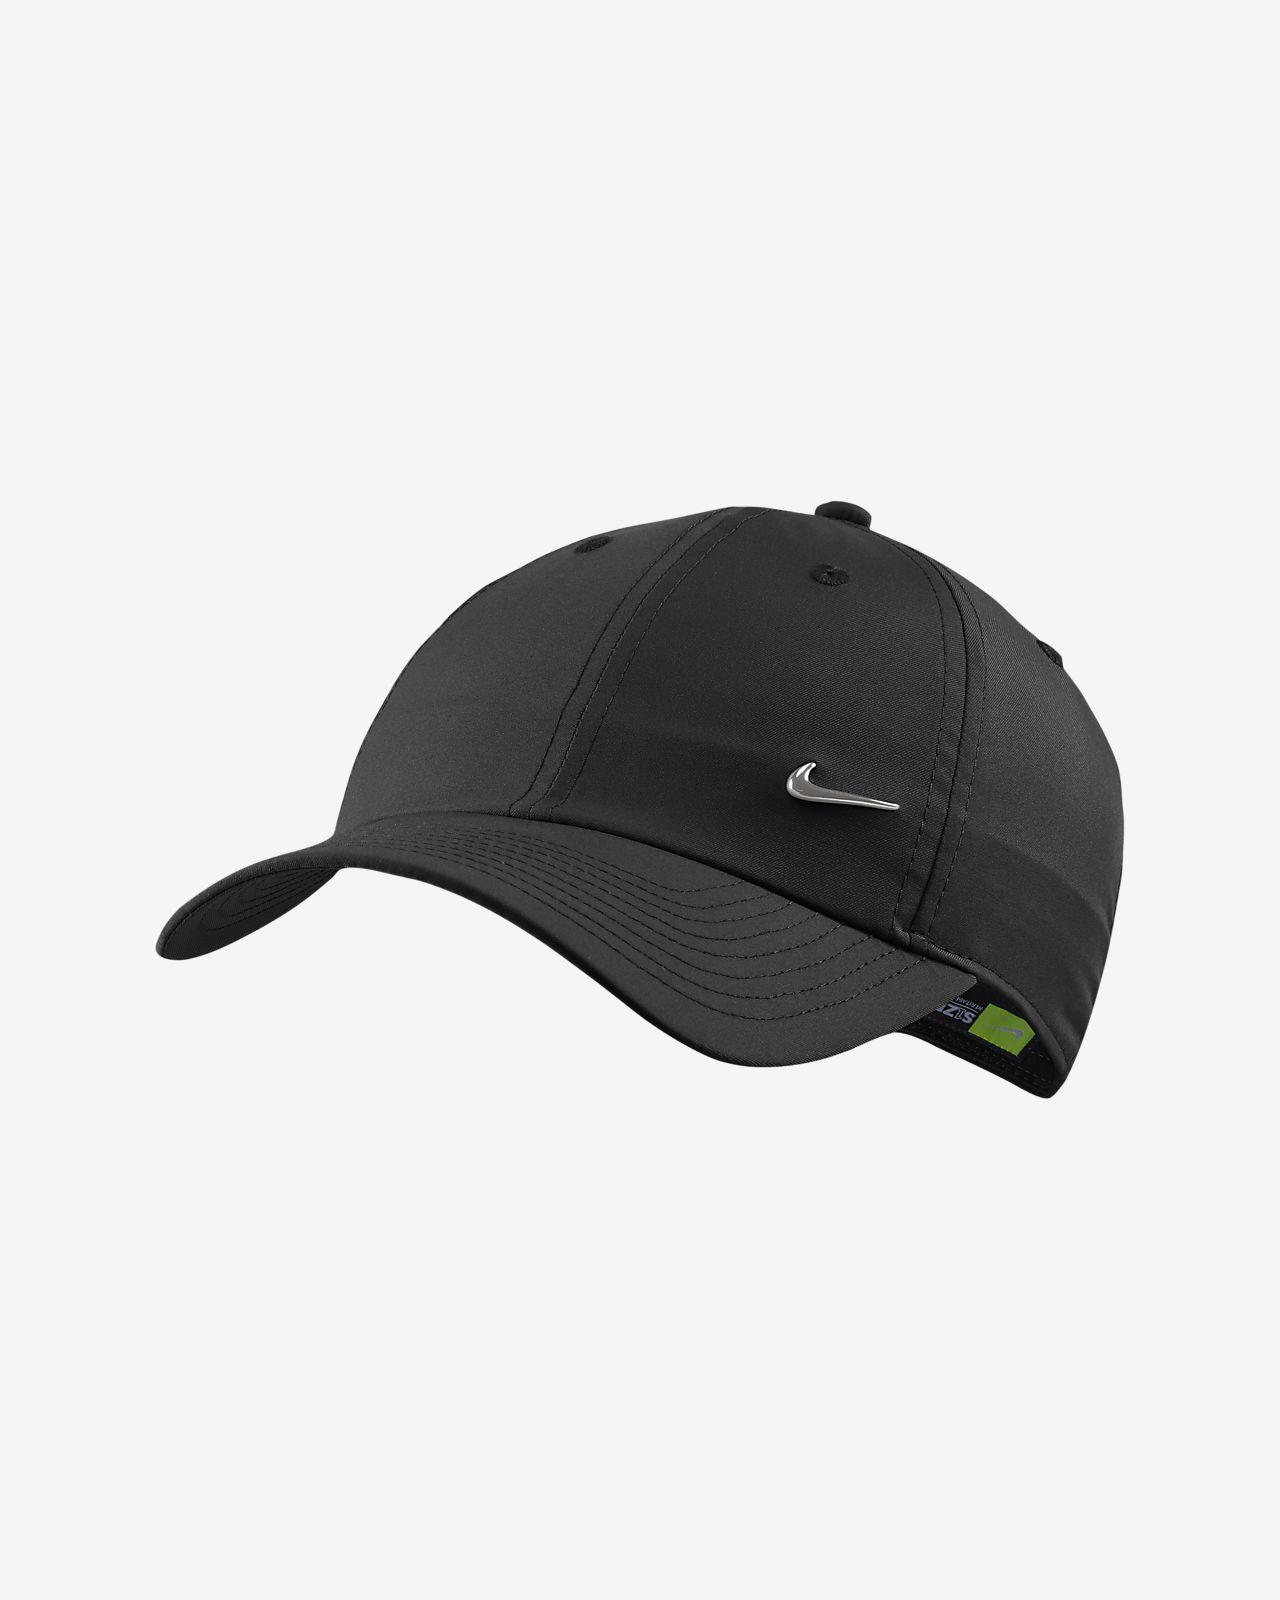 Nike Metal Swoosh H86 Adjustable Hat